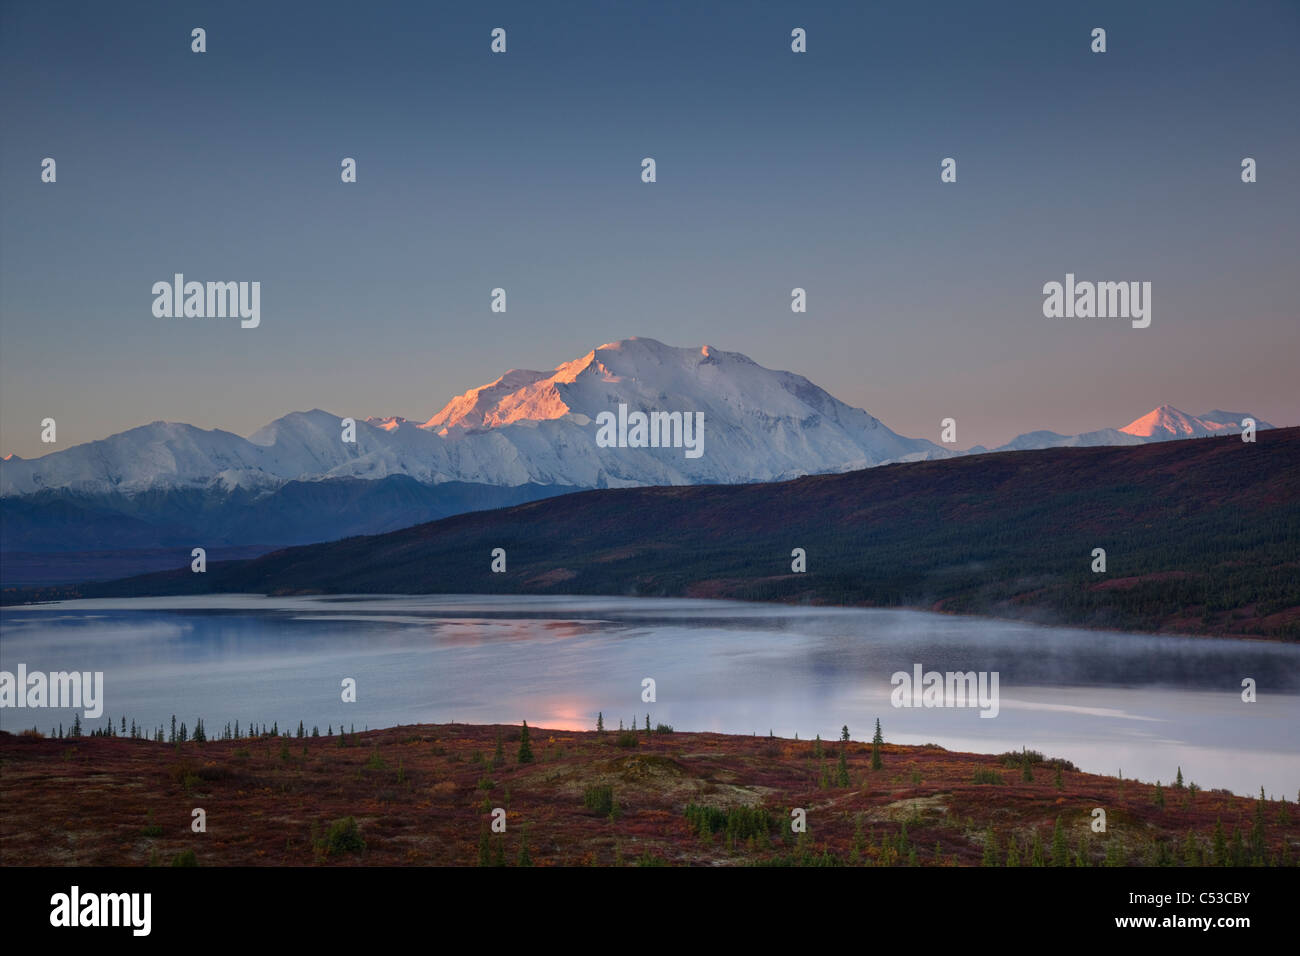 Scenic landscape of Mt. McKinley and Wonder lake in the morning, Denali National Park, Interior Alaska, Autumn. - Stock Image